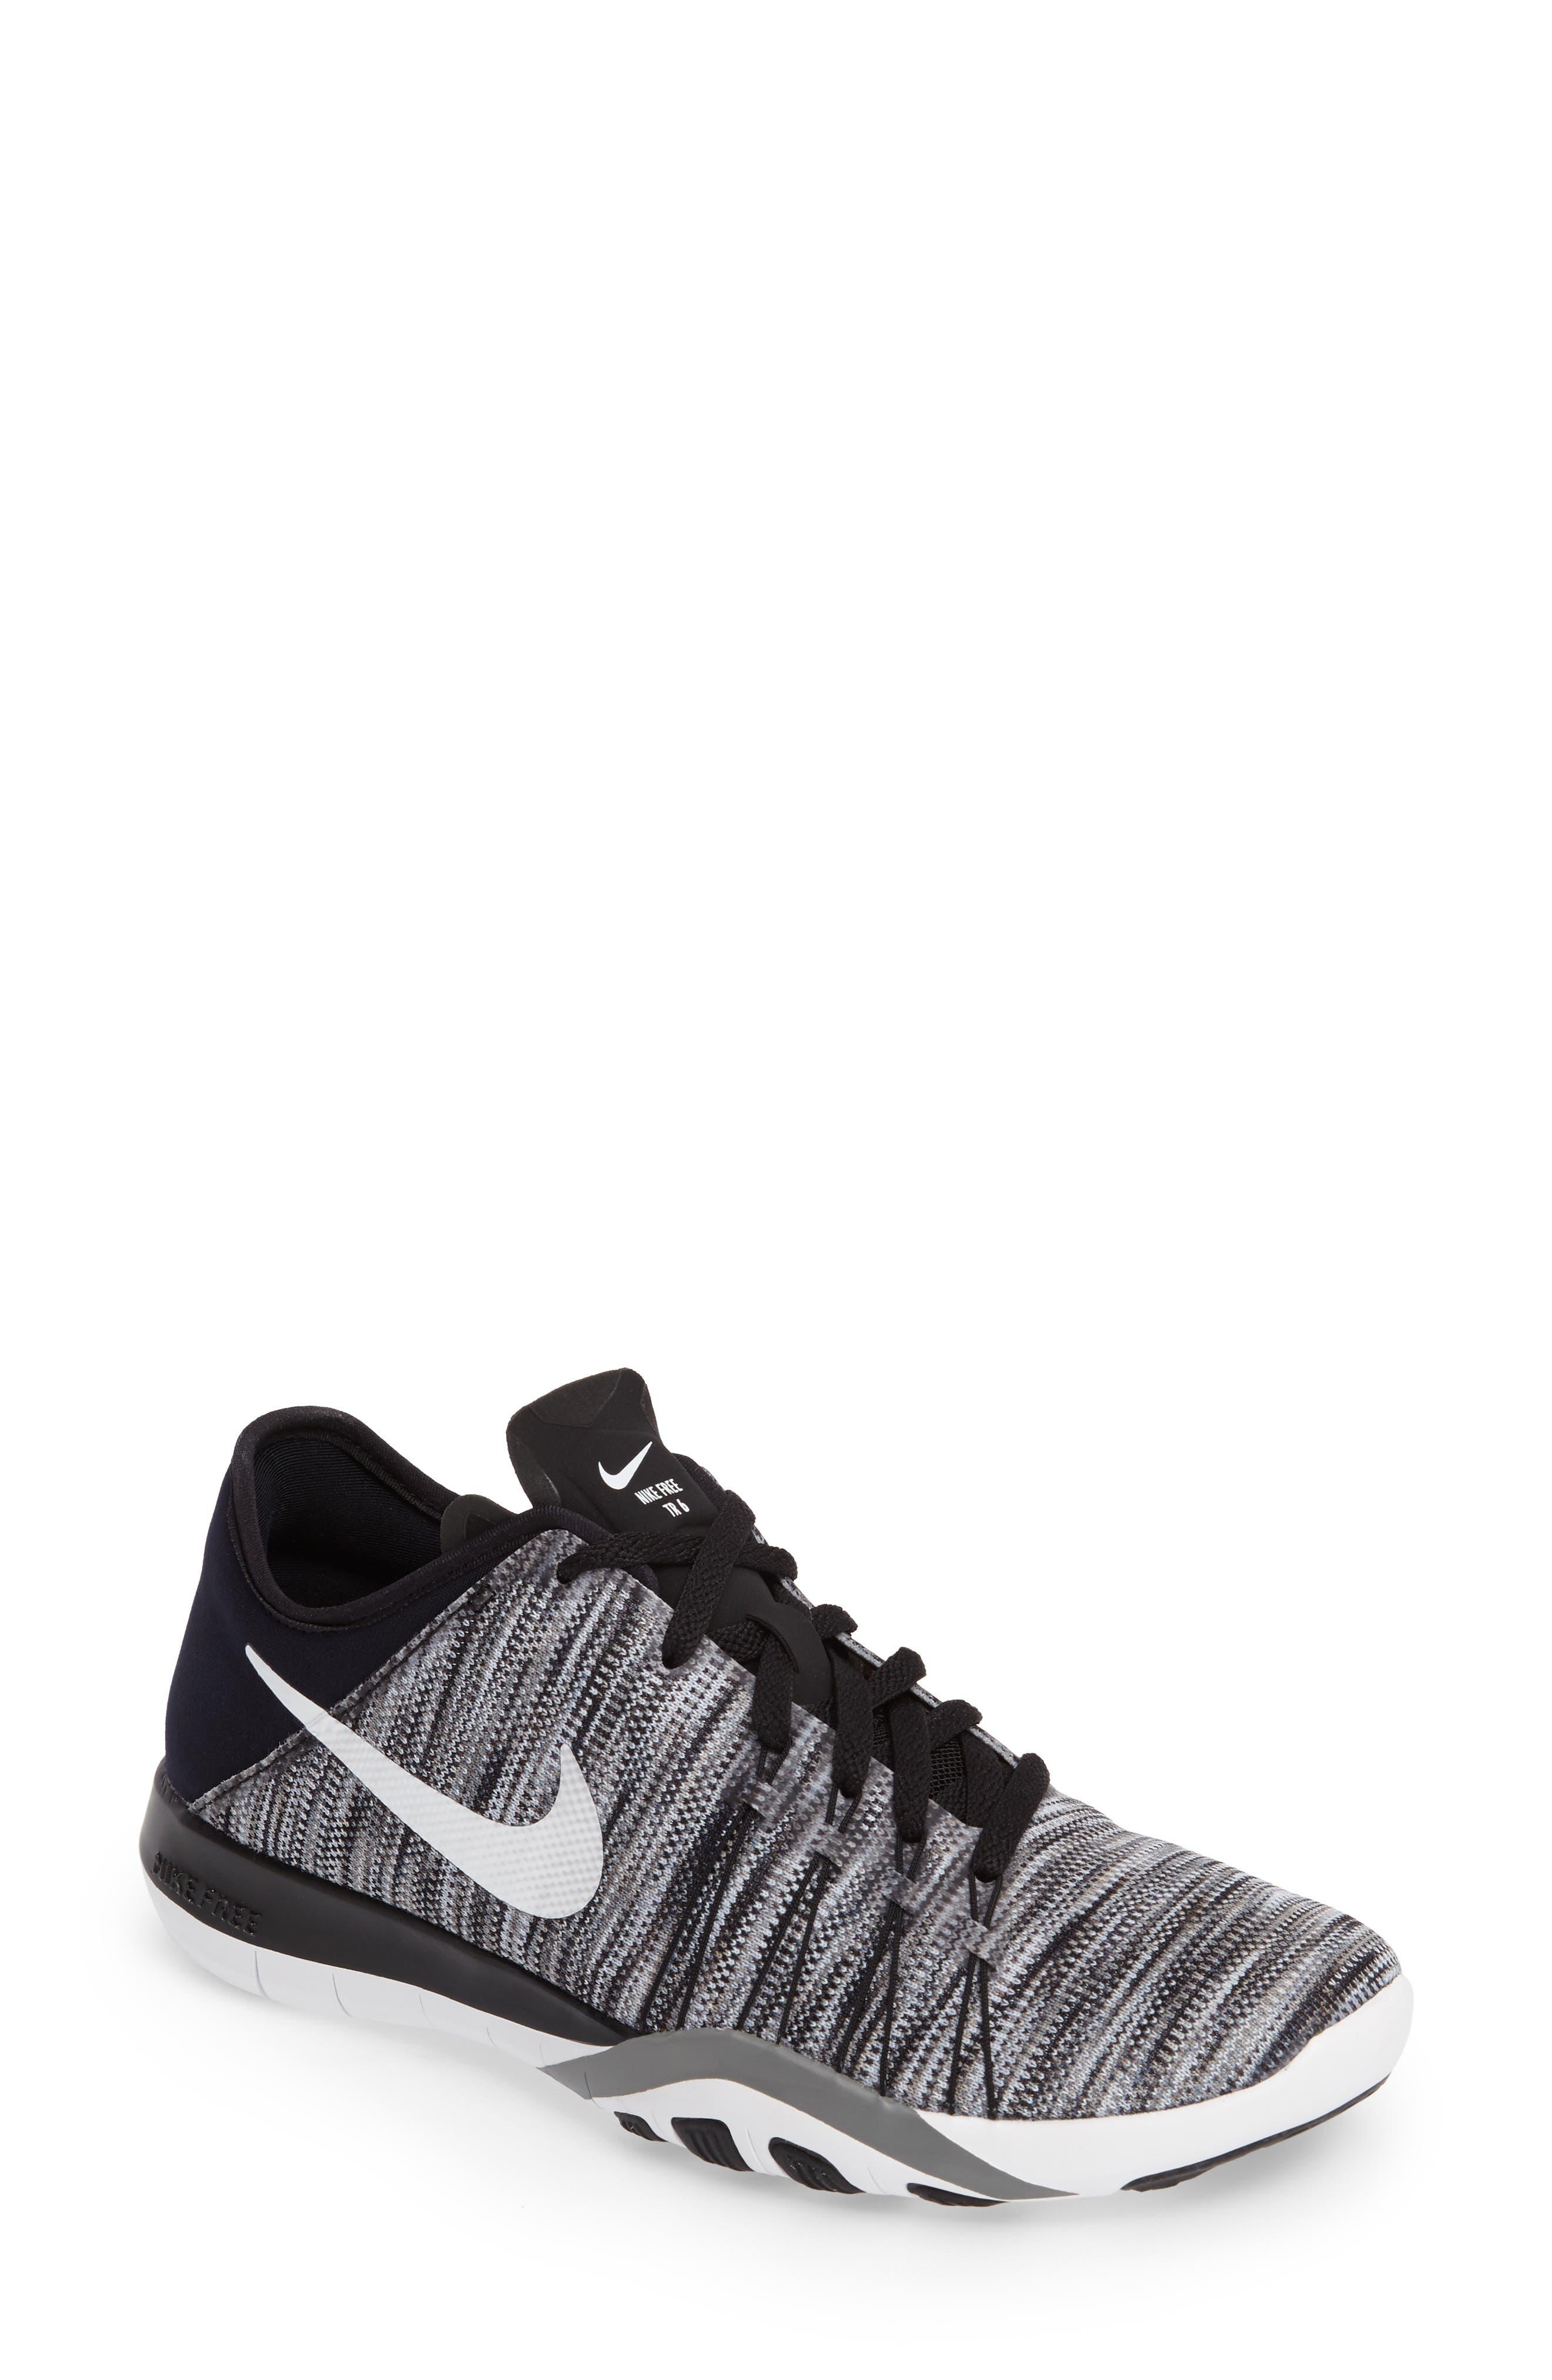 Main Image - Nike Free TR 6 AMP Training Shoe (Women)